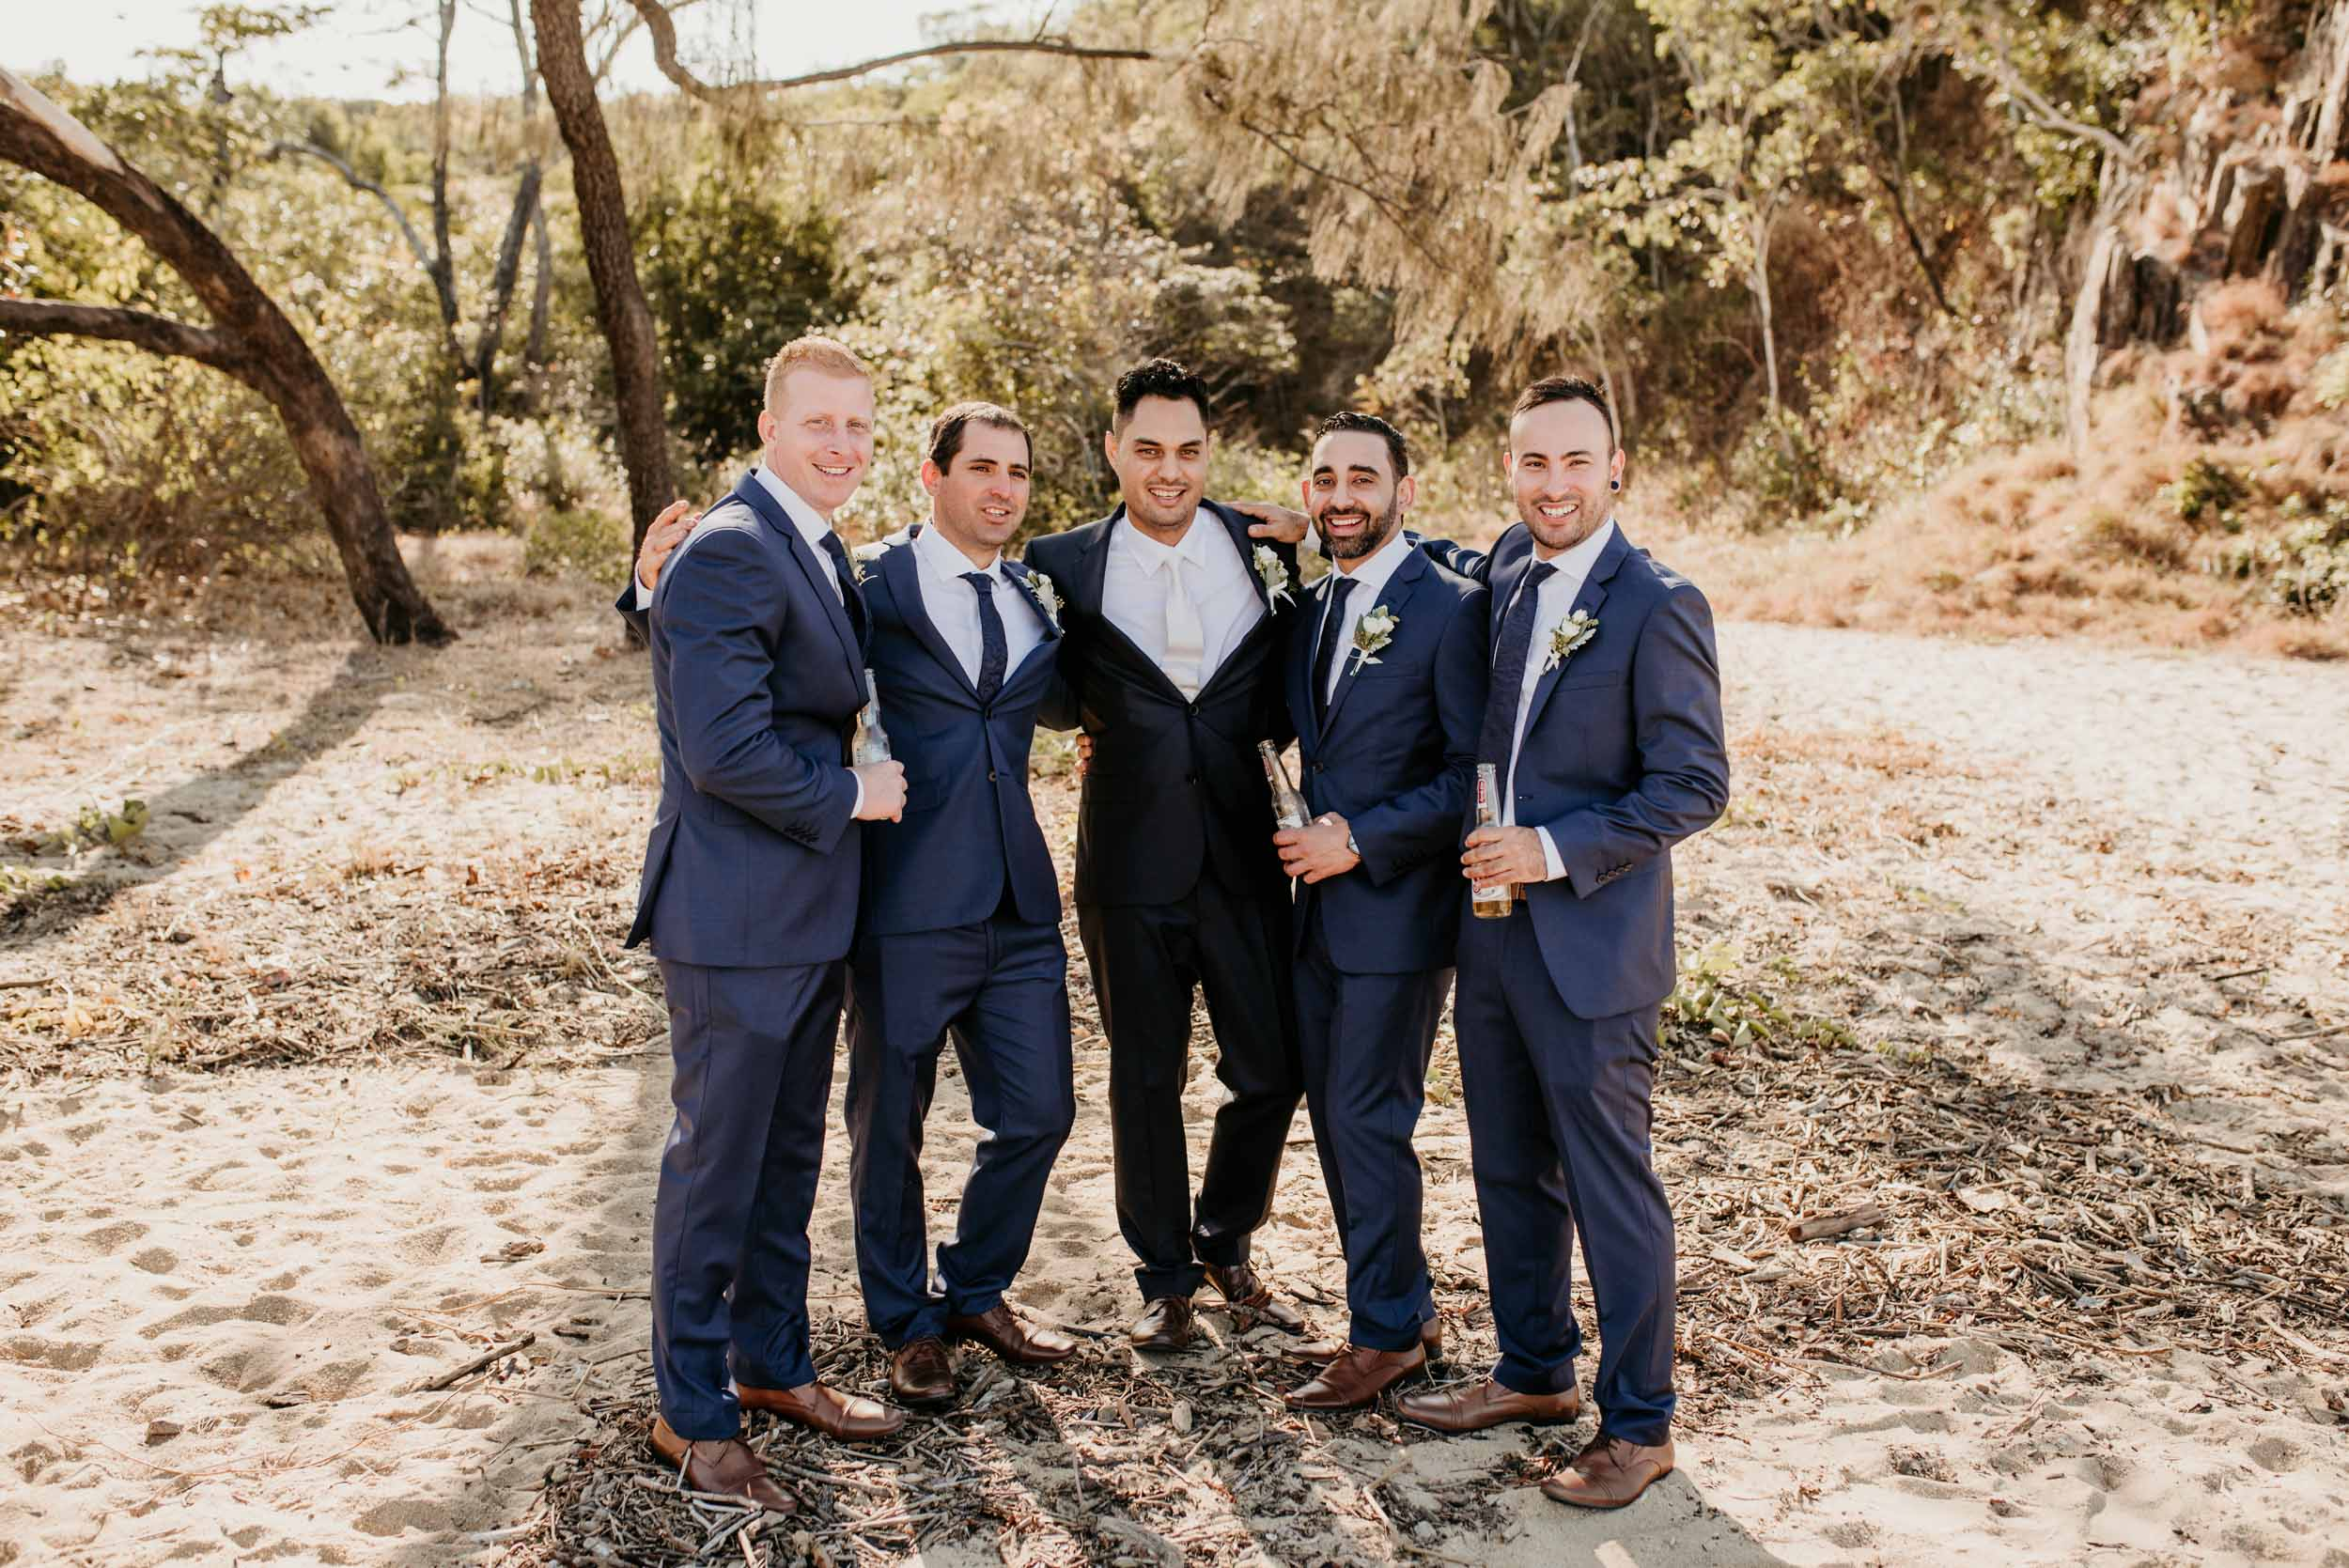 The Raw Photographer - Cairns Wedding Photographer - Beach Palm Cove Ceremony - Dress Irene Costa's Devine Bridal - Queensland-41.jpg